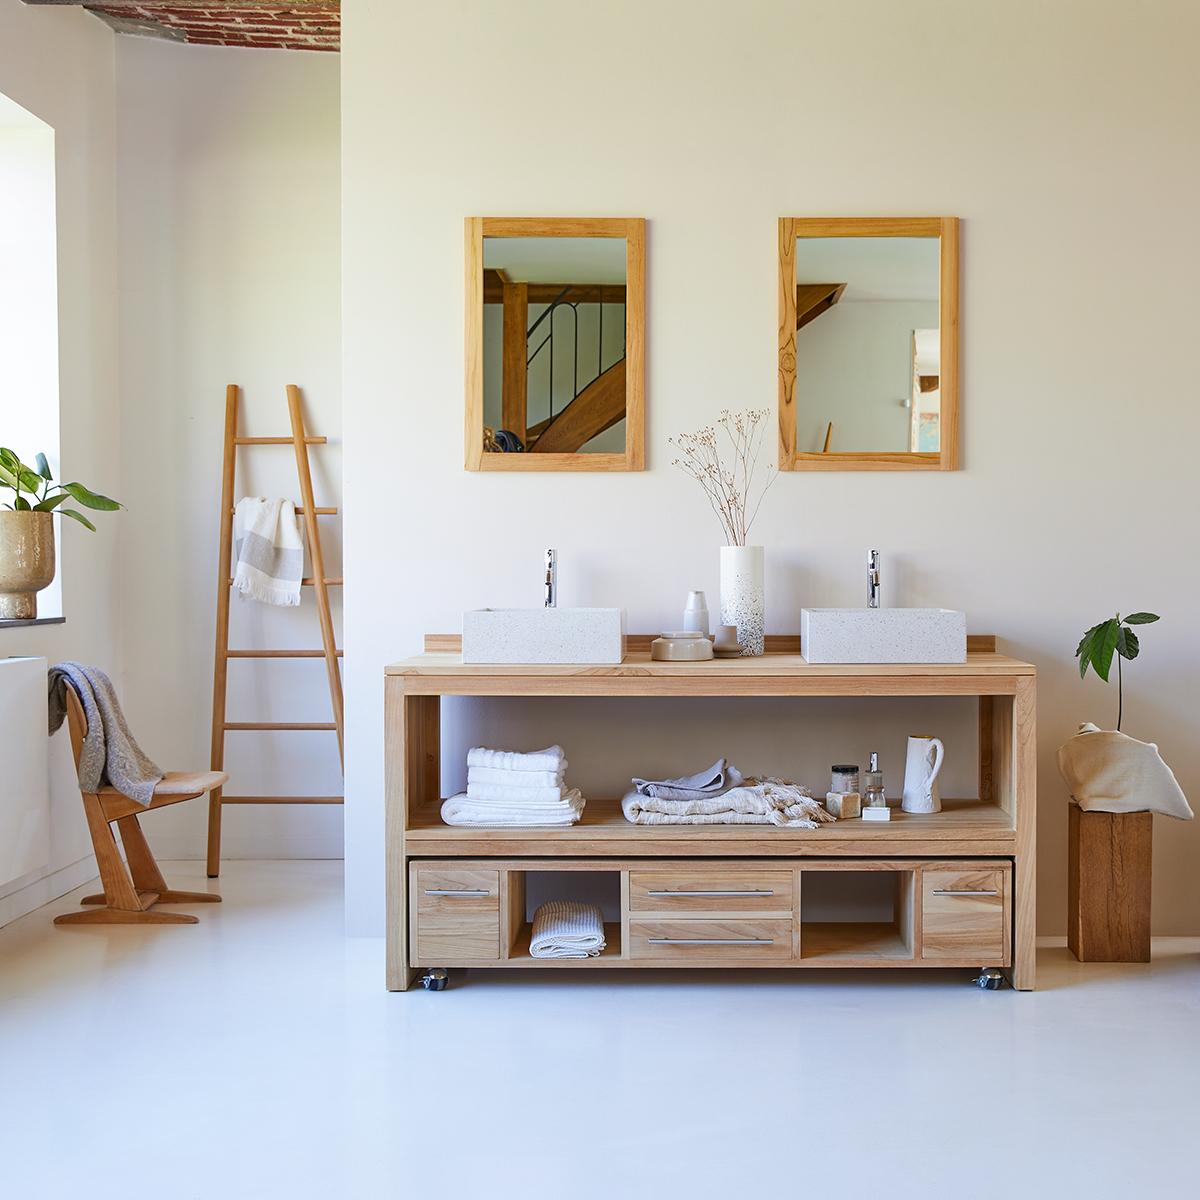 Meuble Salle de bain en teck massif brut 160 Layang